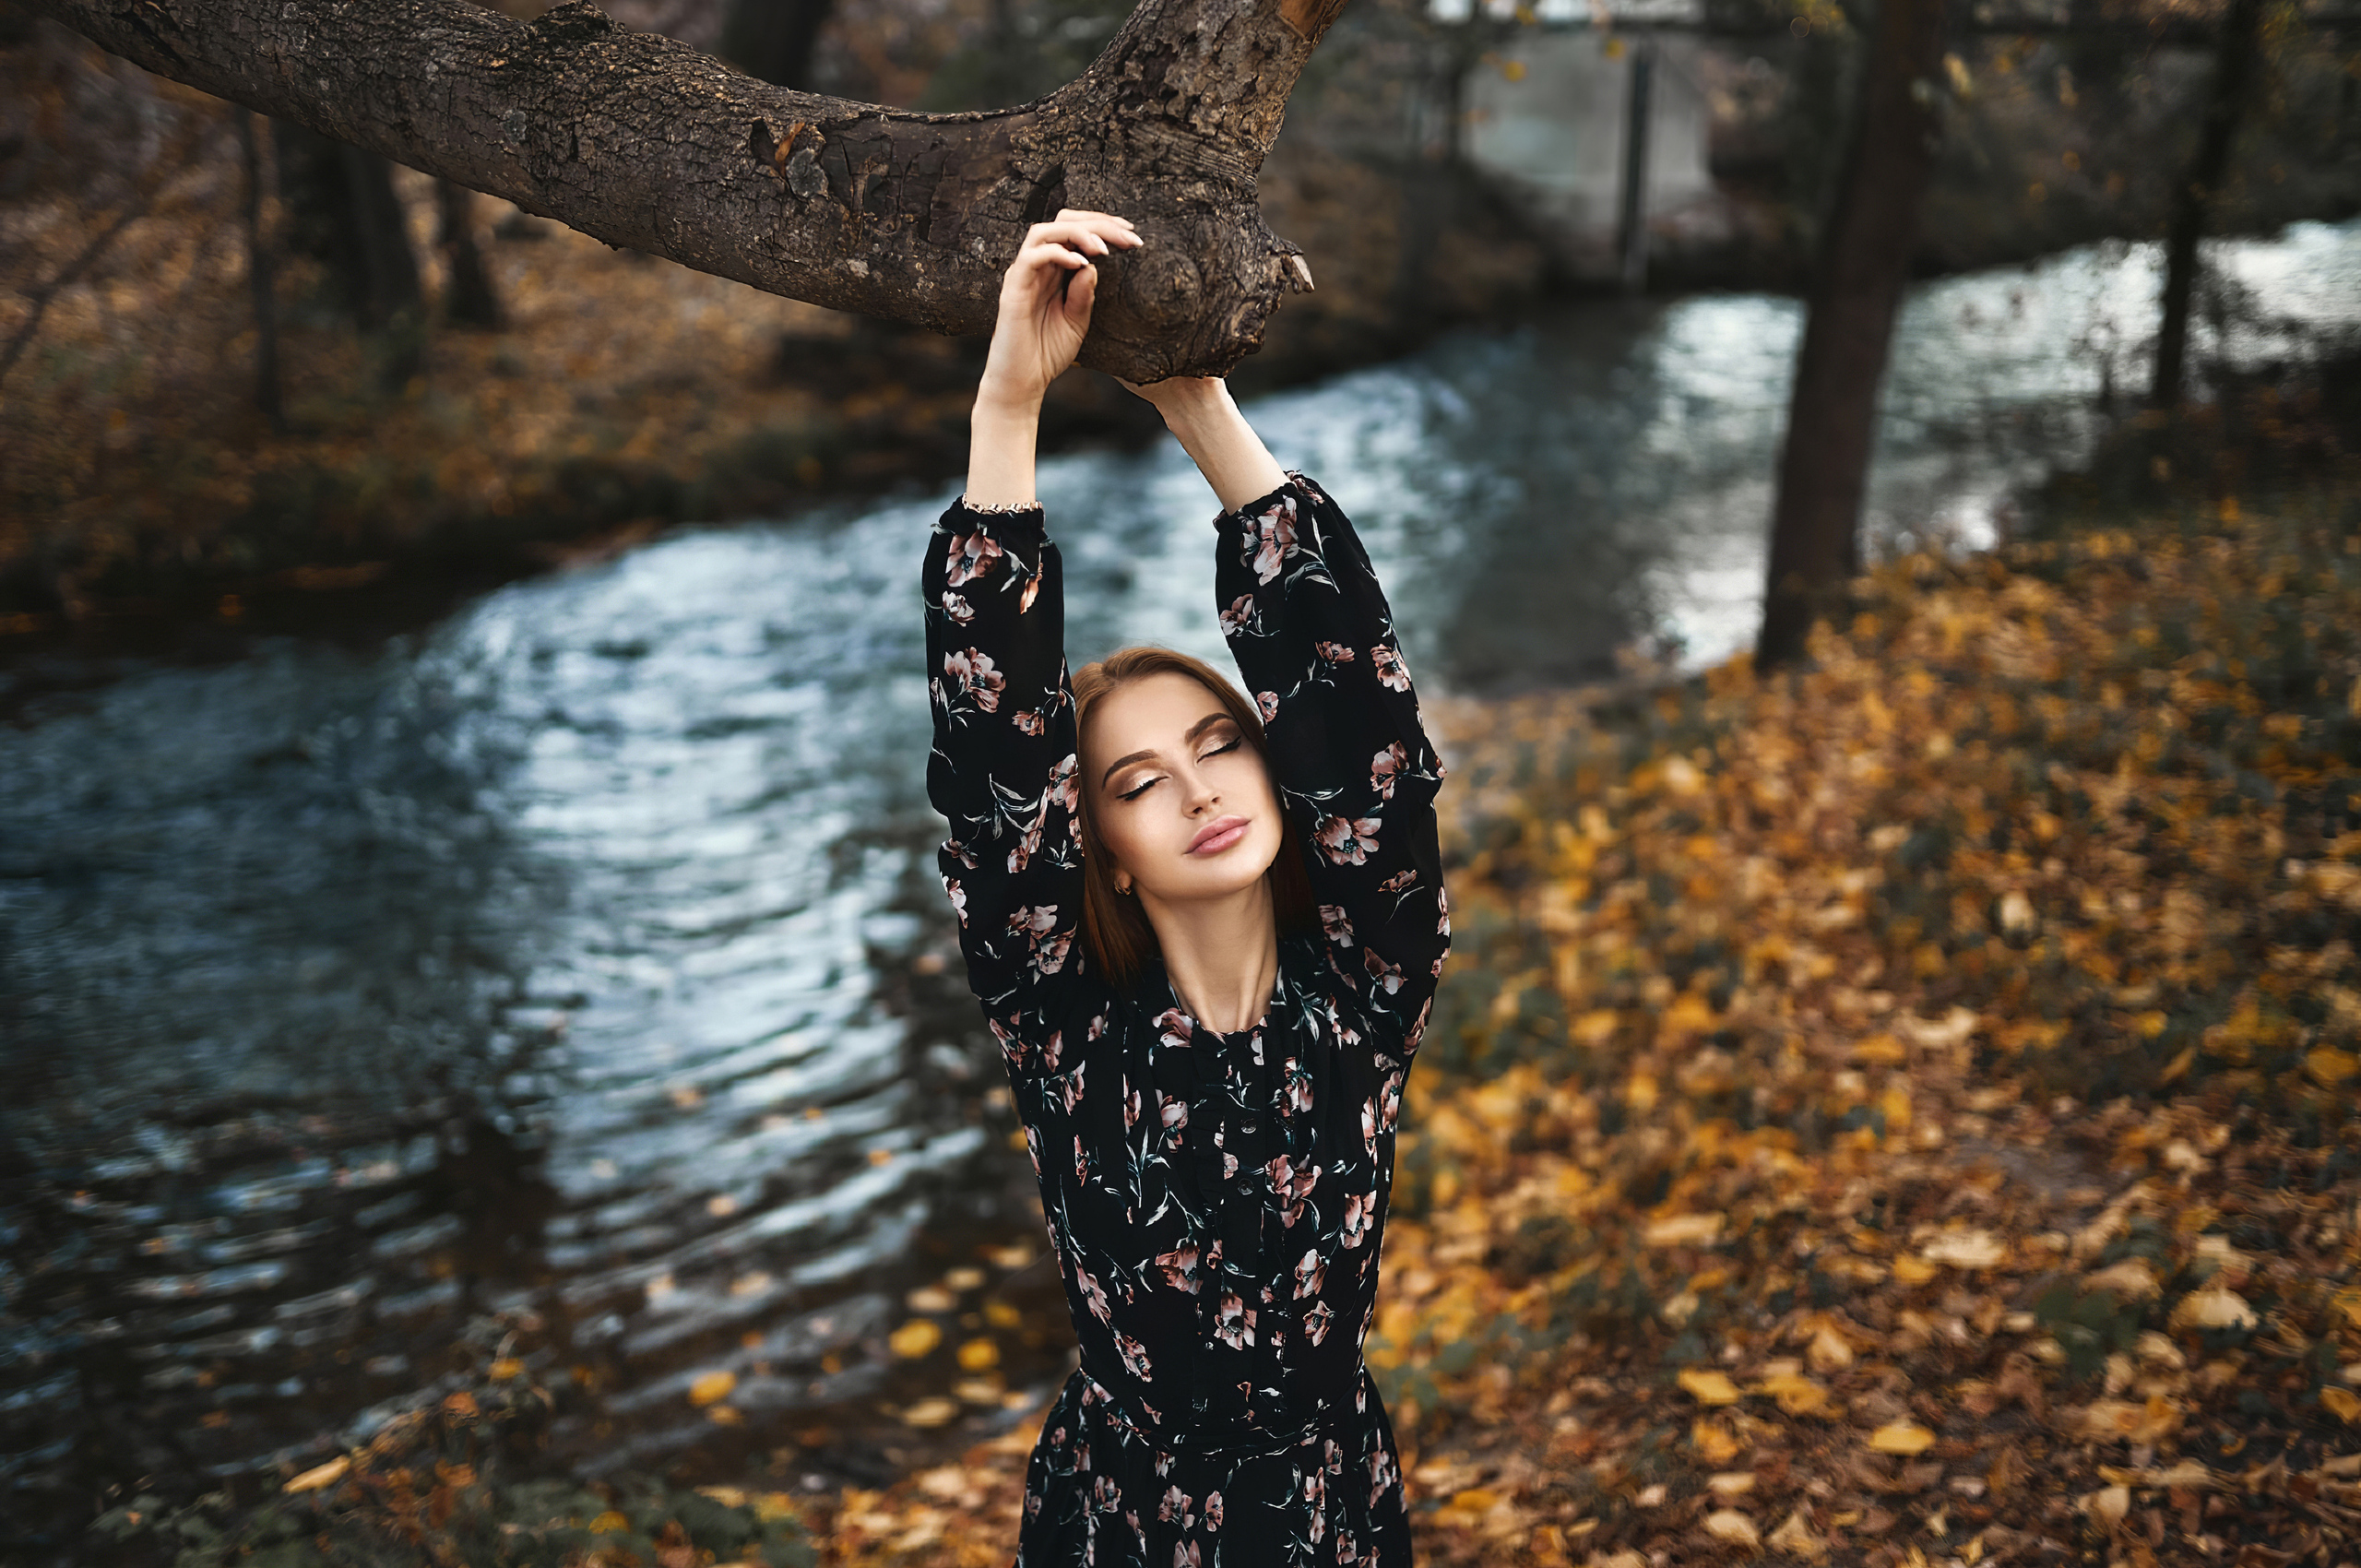 girl-nature-outdoor-tree-4k-5v.jpg